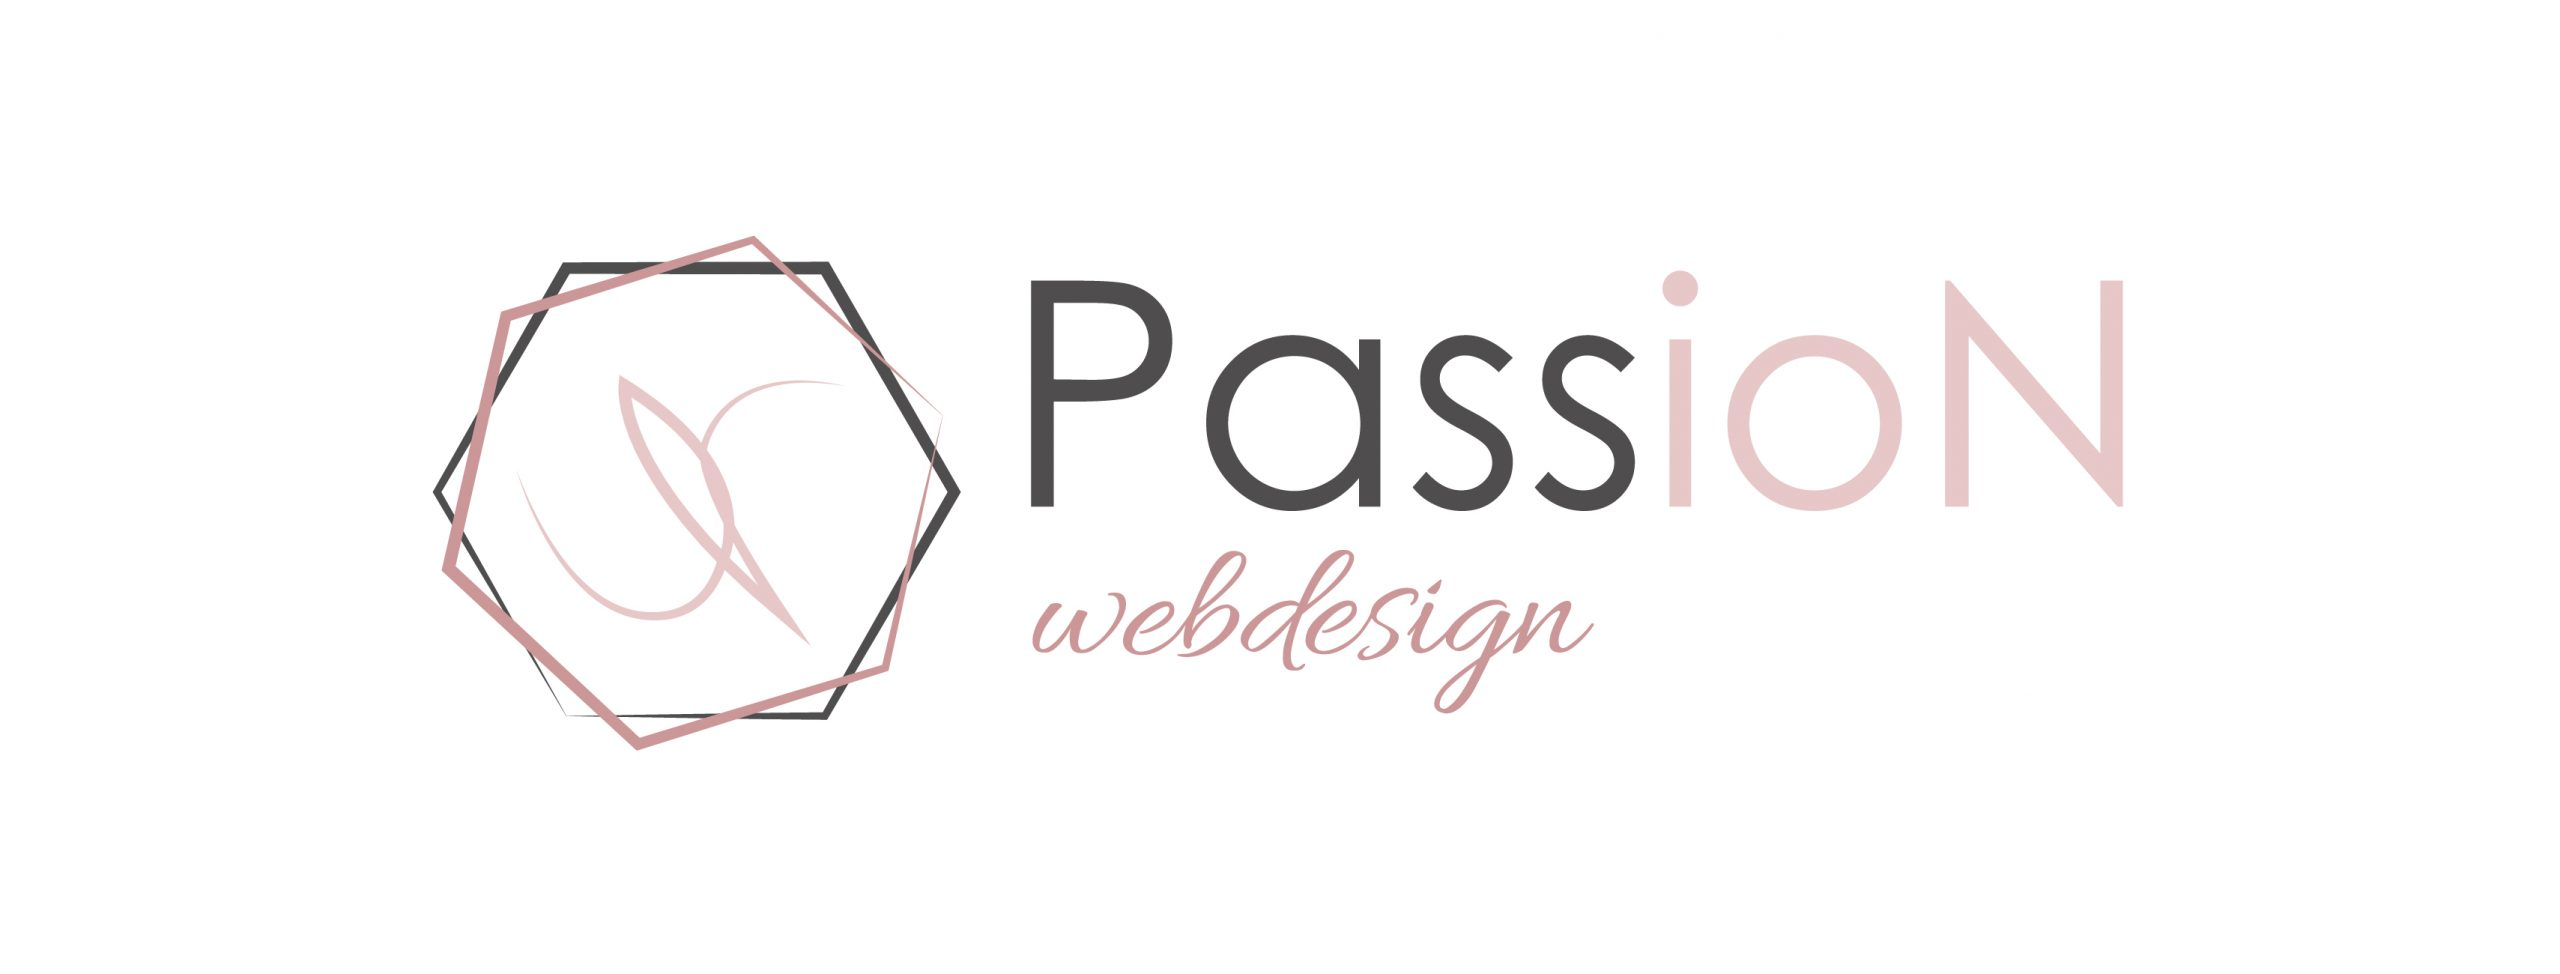 PassioN webdesign